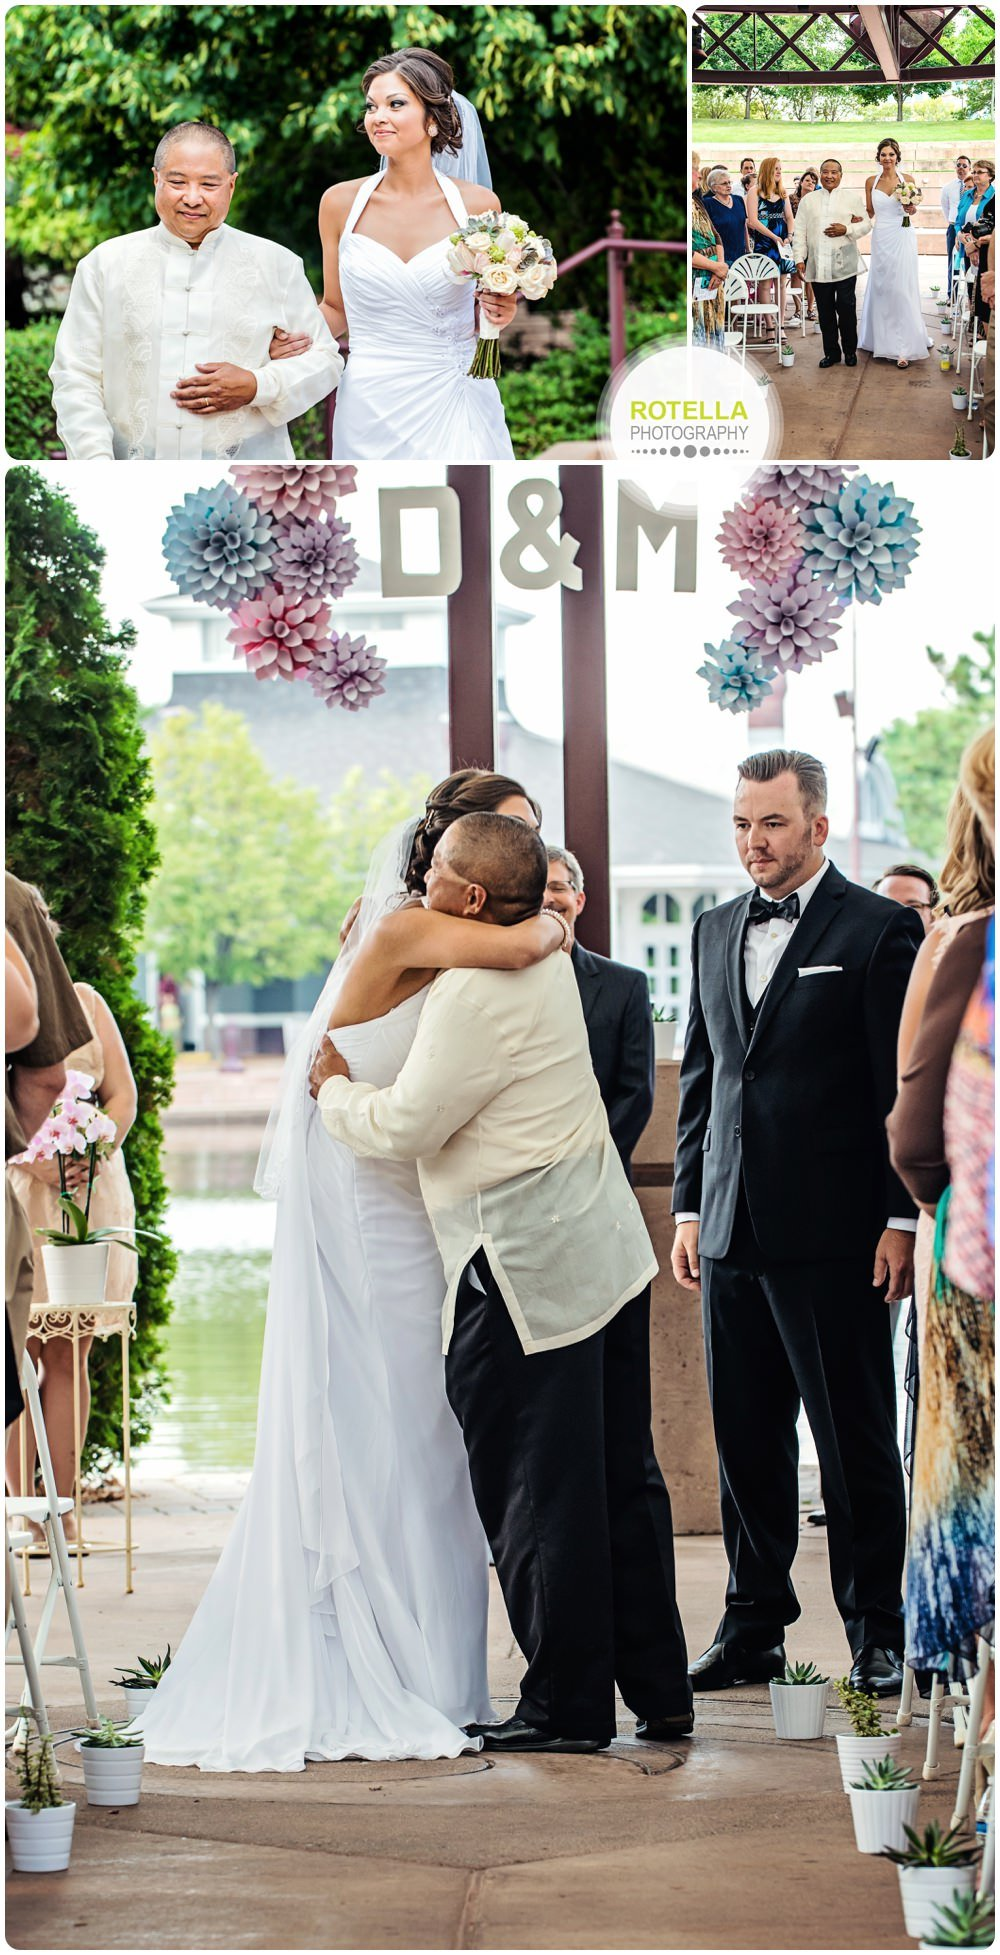 MELANIE-DEREK-MINNESOTA-WEDDING-PHOTOGRAPHY-ROTELLA-PHOTOGRAPHY_2015-10